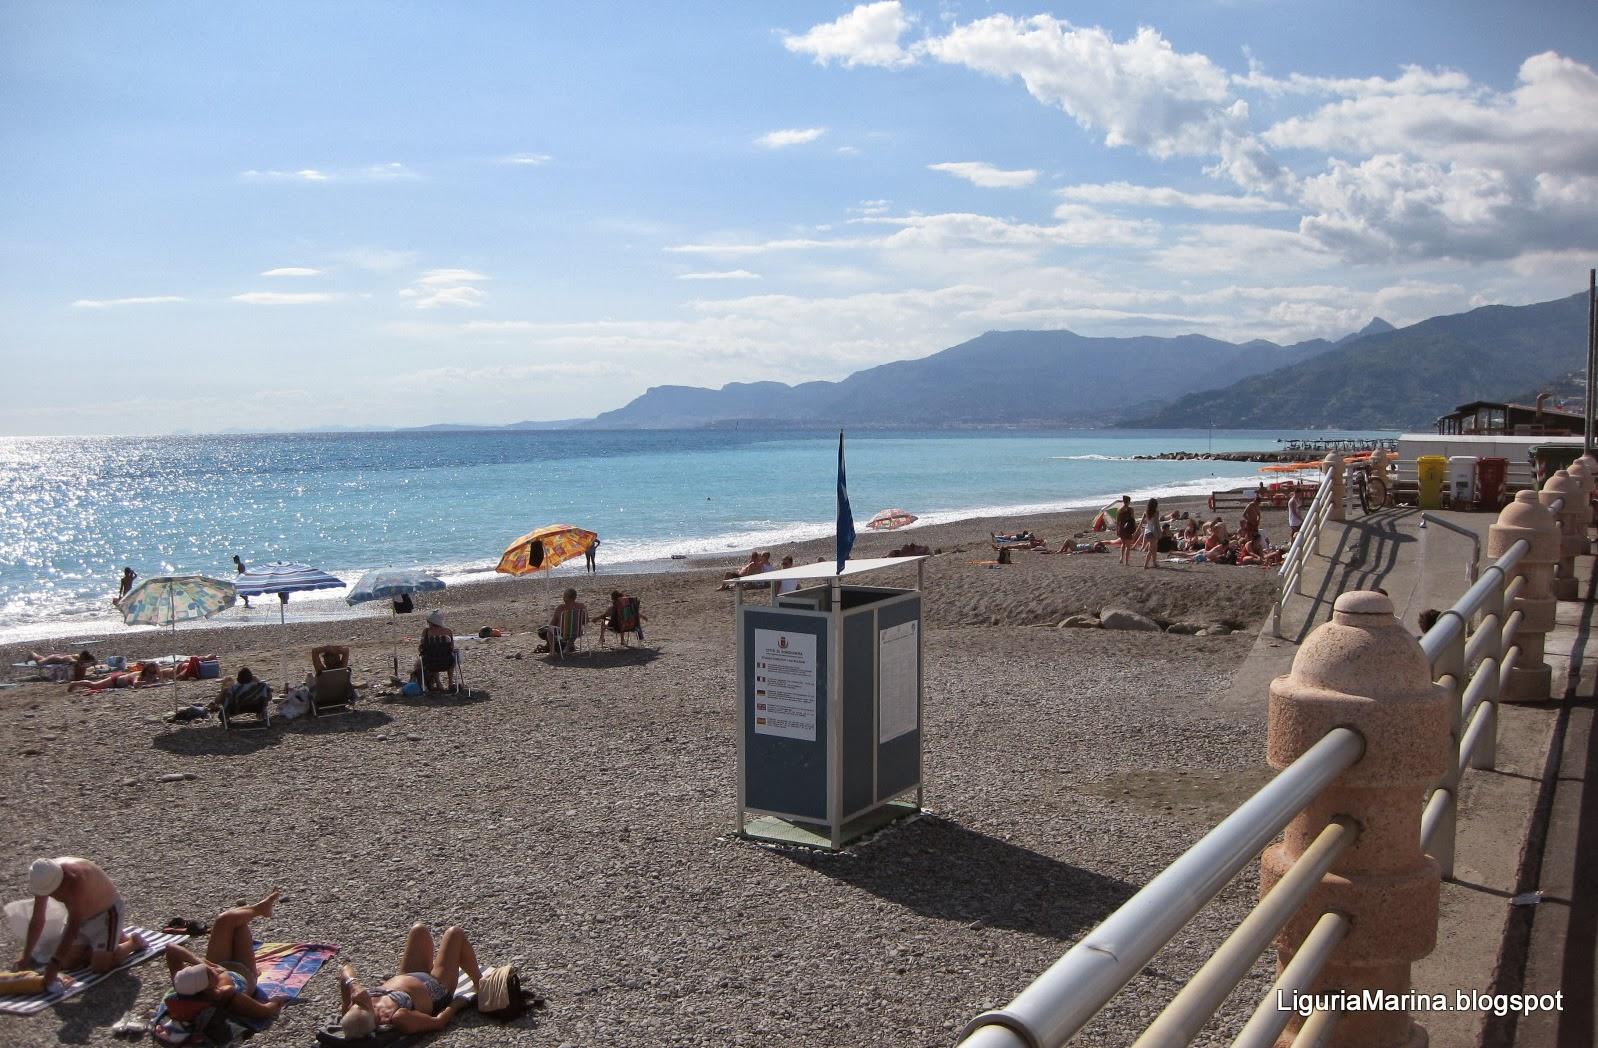 LiguriaMarina: Bordighera